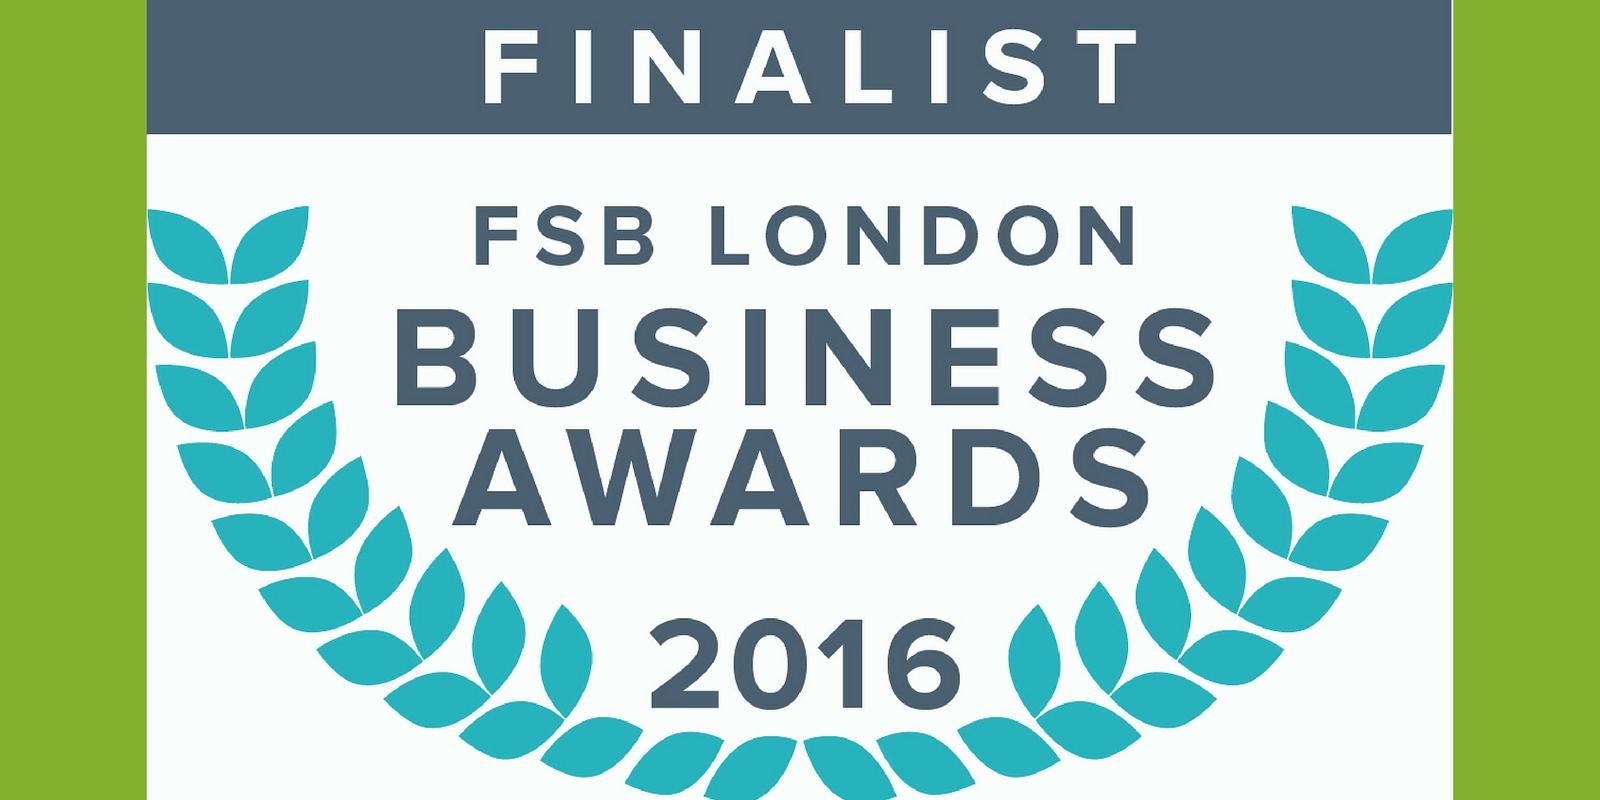 Business clan finalist at FSB London Awards